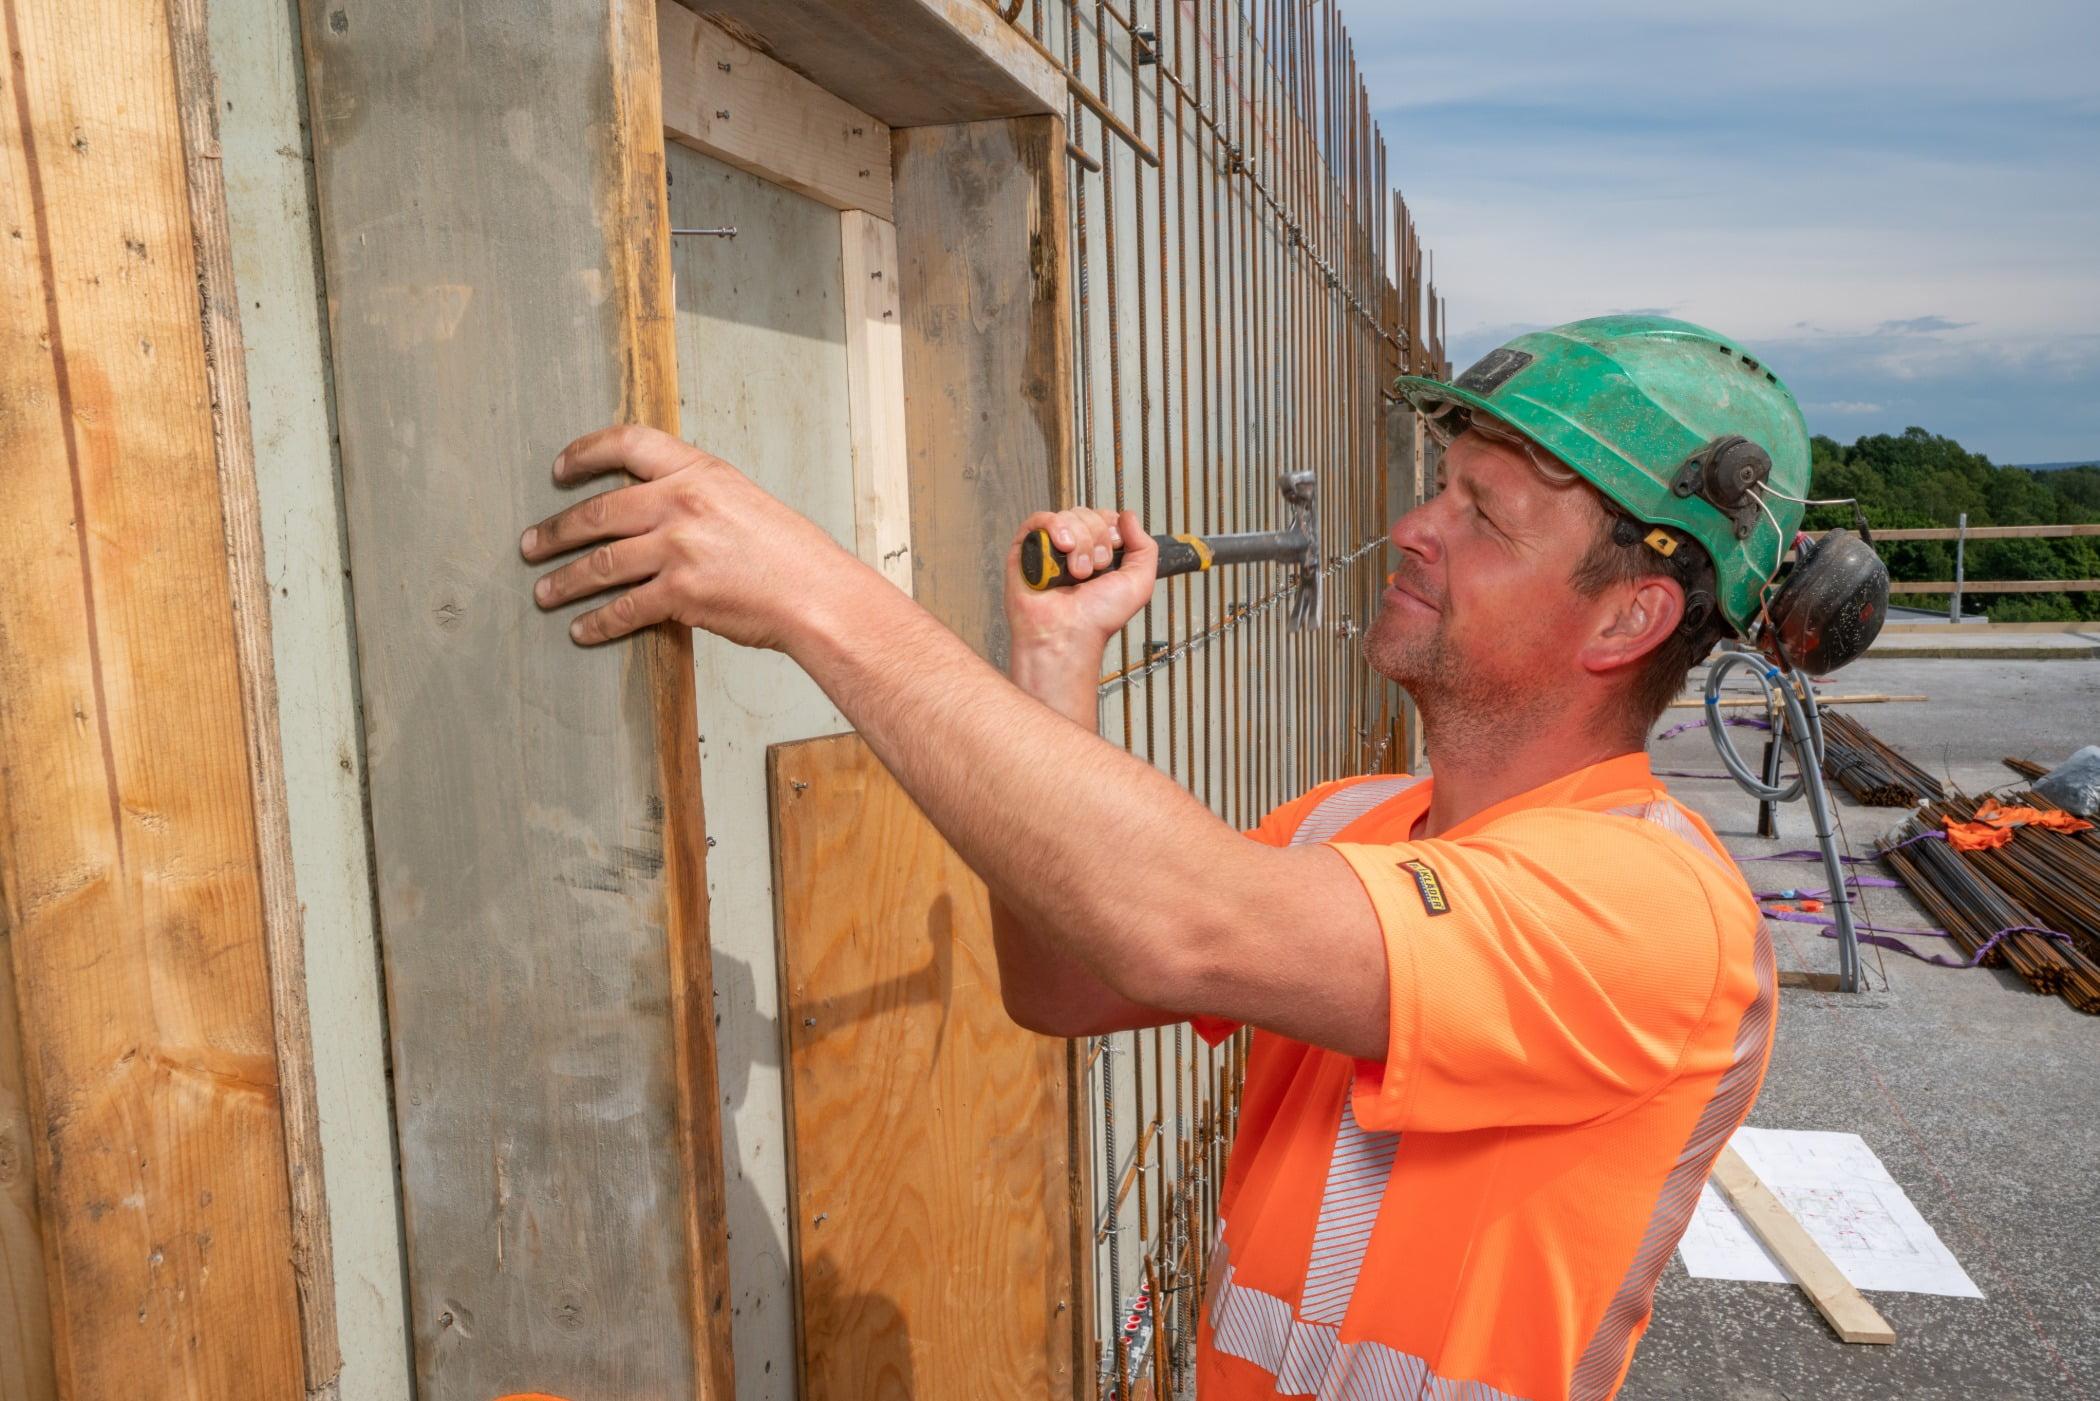 Hard hat, Blue-collar worker, Sky, Tradesman, Workwear, Wood, Building, Cloud, Wall, Vest